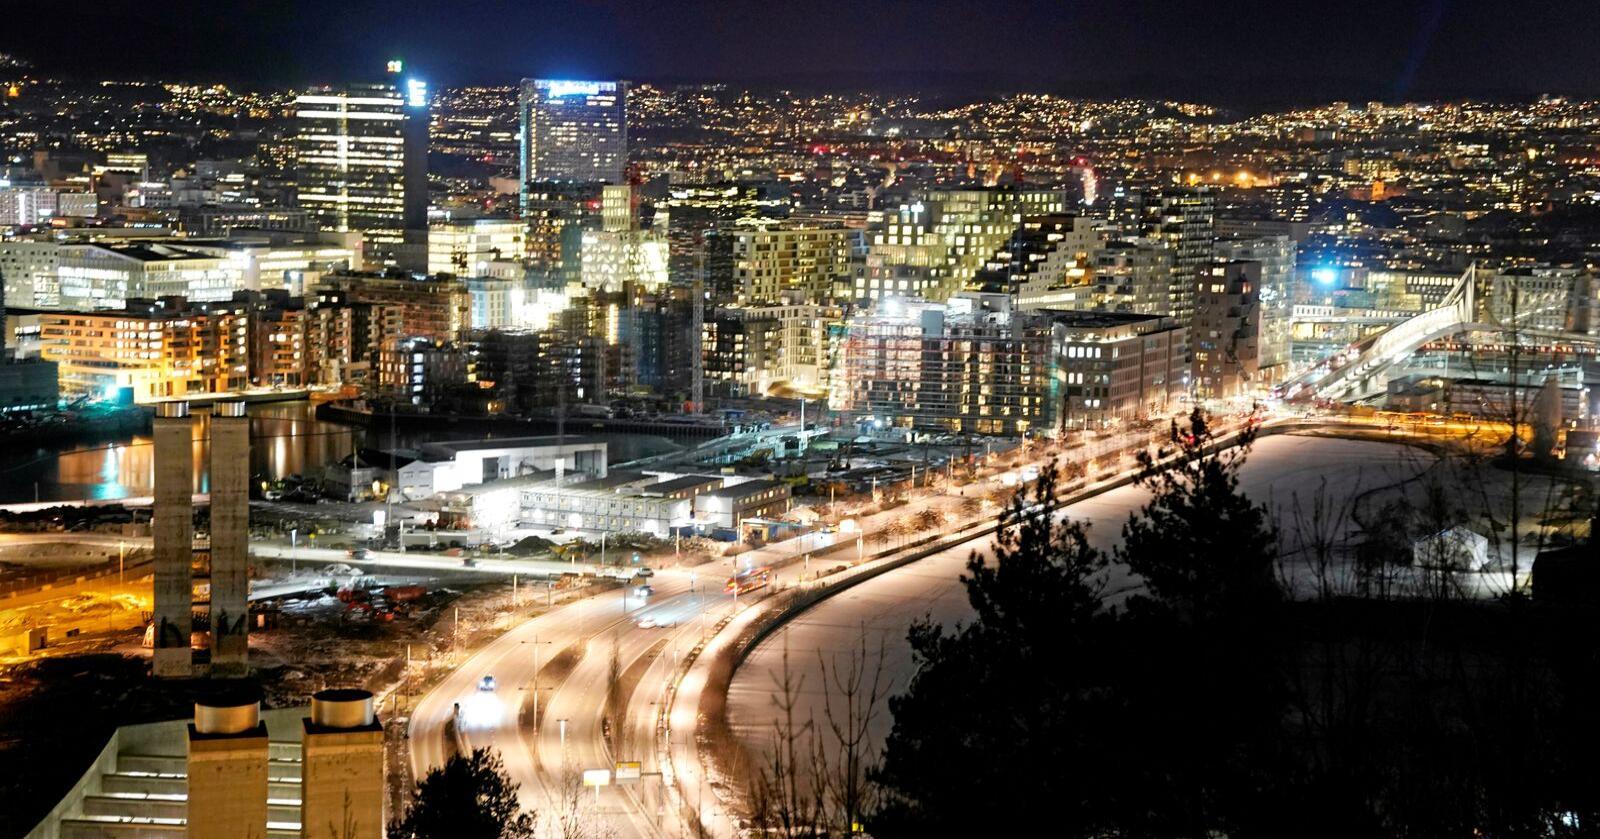 Oslo: Oslo har langt lågare klimagassutslepp per innbyggjar enn mange distriktskommnunar. På den andre sida bind Oslo også svært mykje mindre klimagassutslepp per innbyggjar enn distriktskommunane. Foto: Cornelius Poppe / NTB scanpix